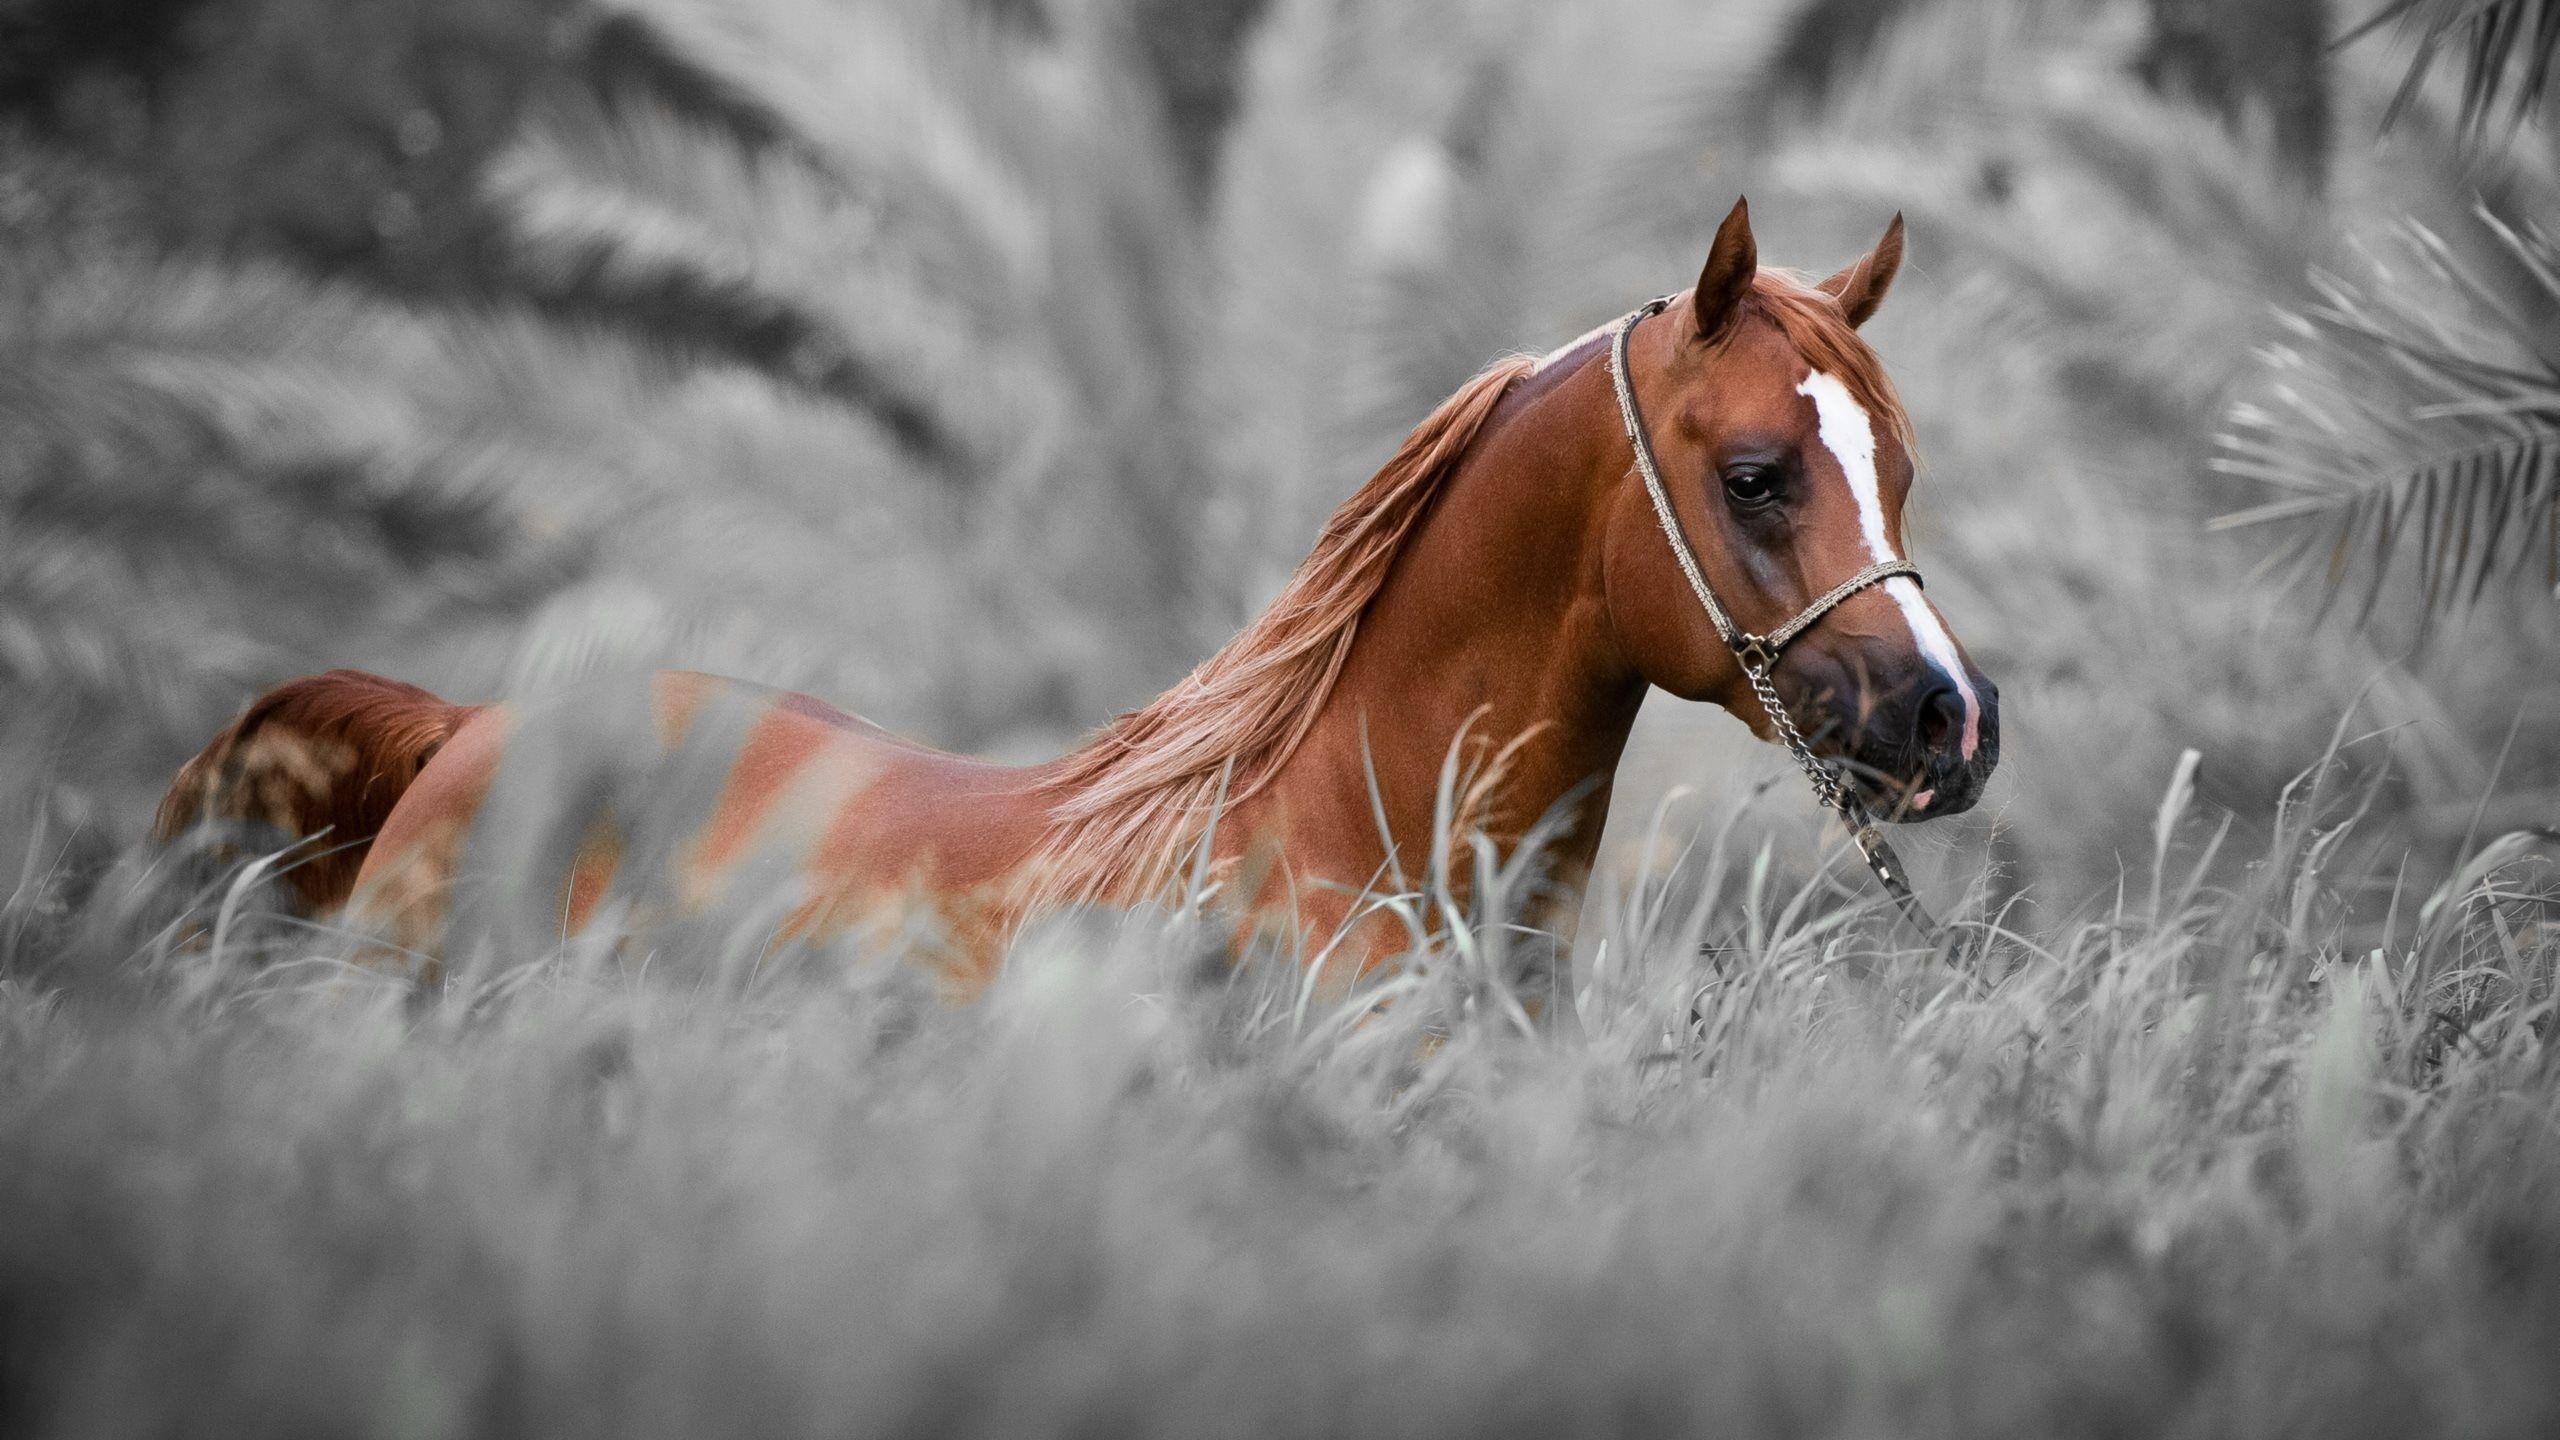 Horse Wallpaper For Windows Nvm